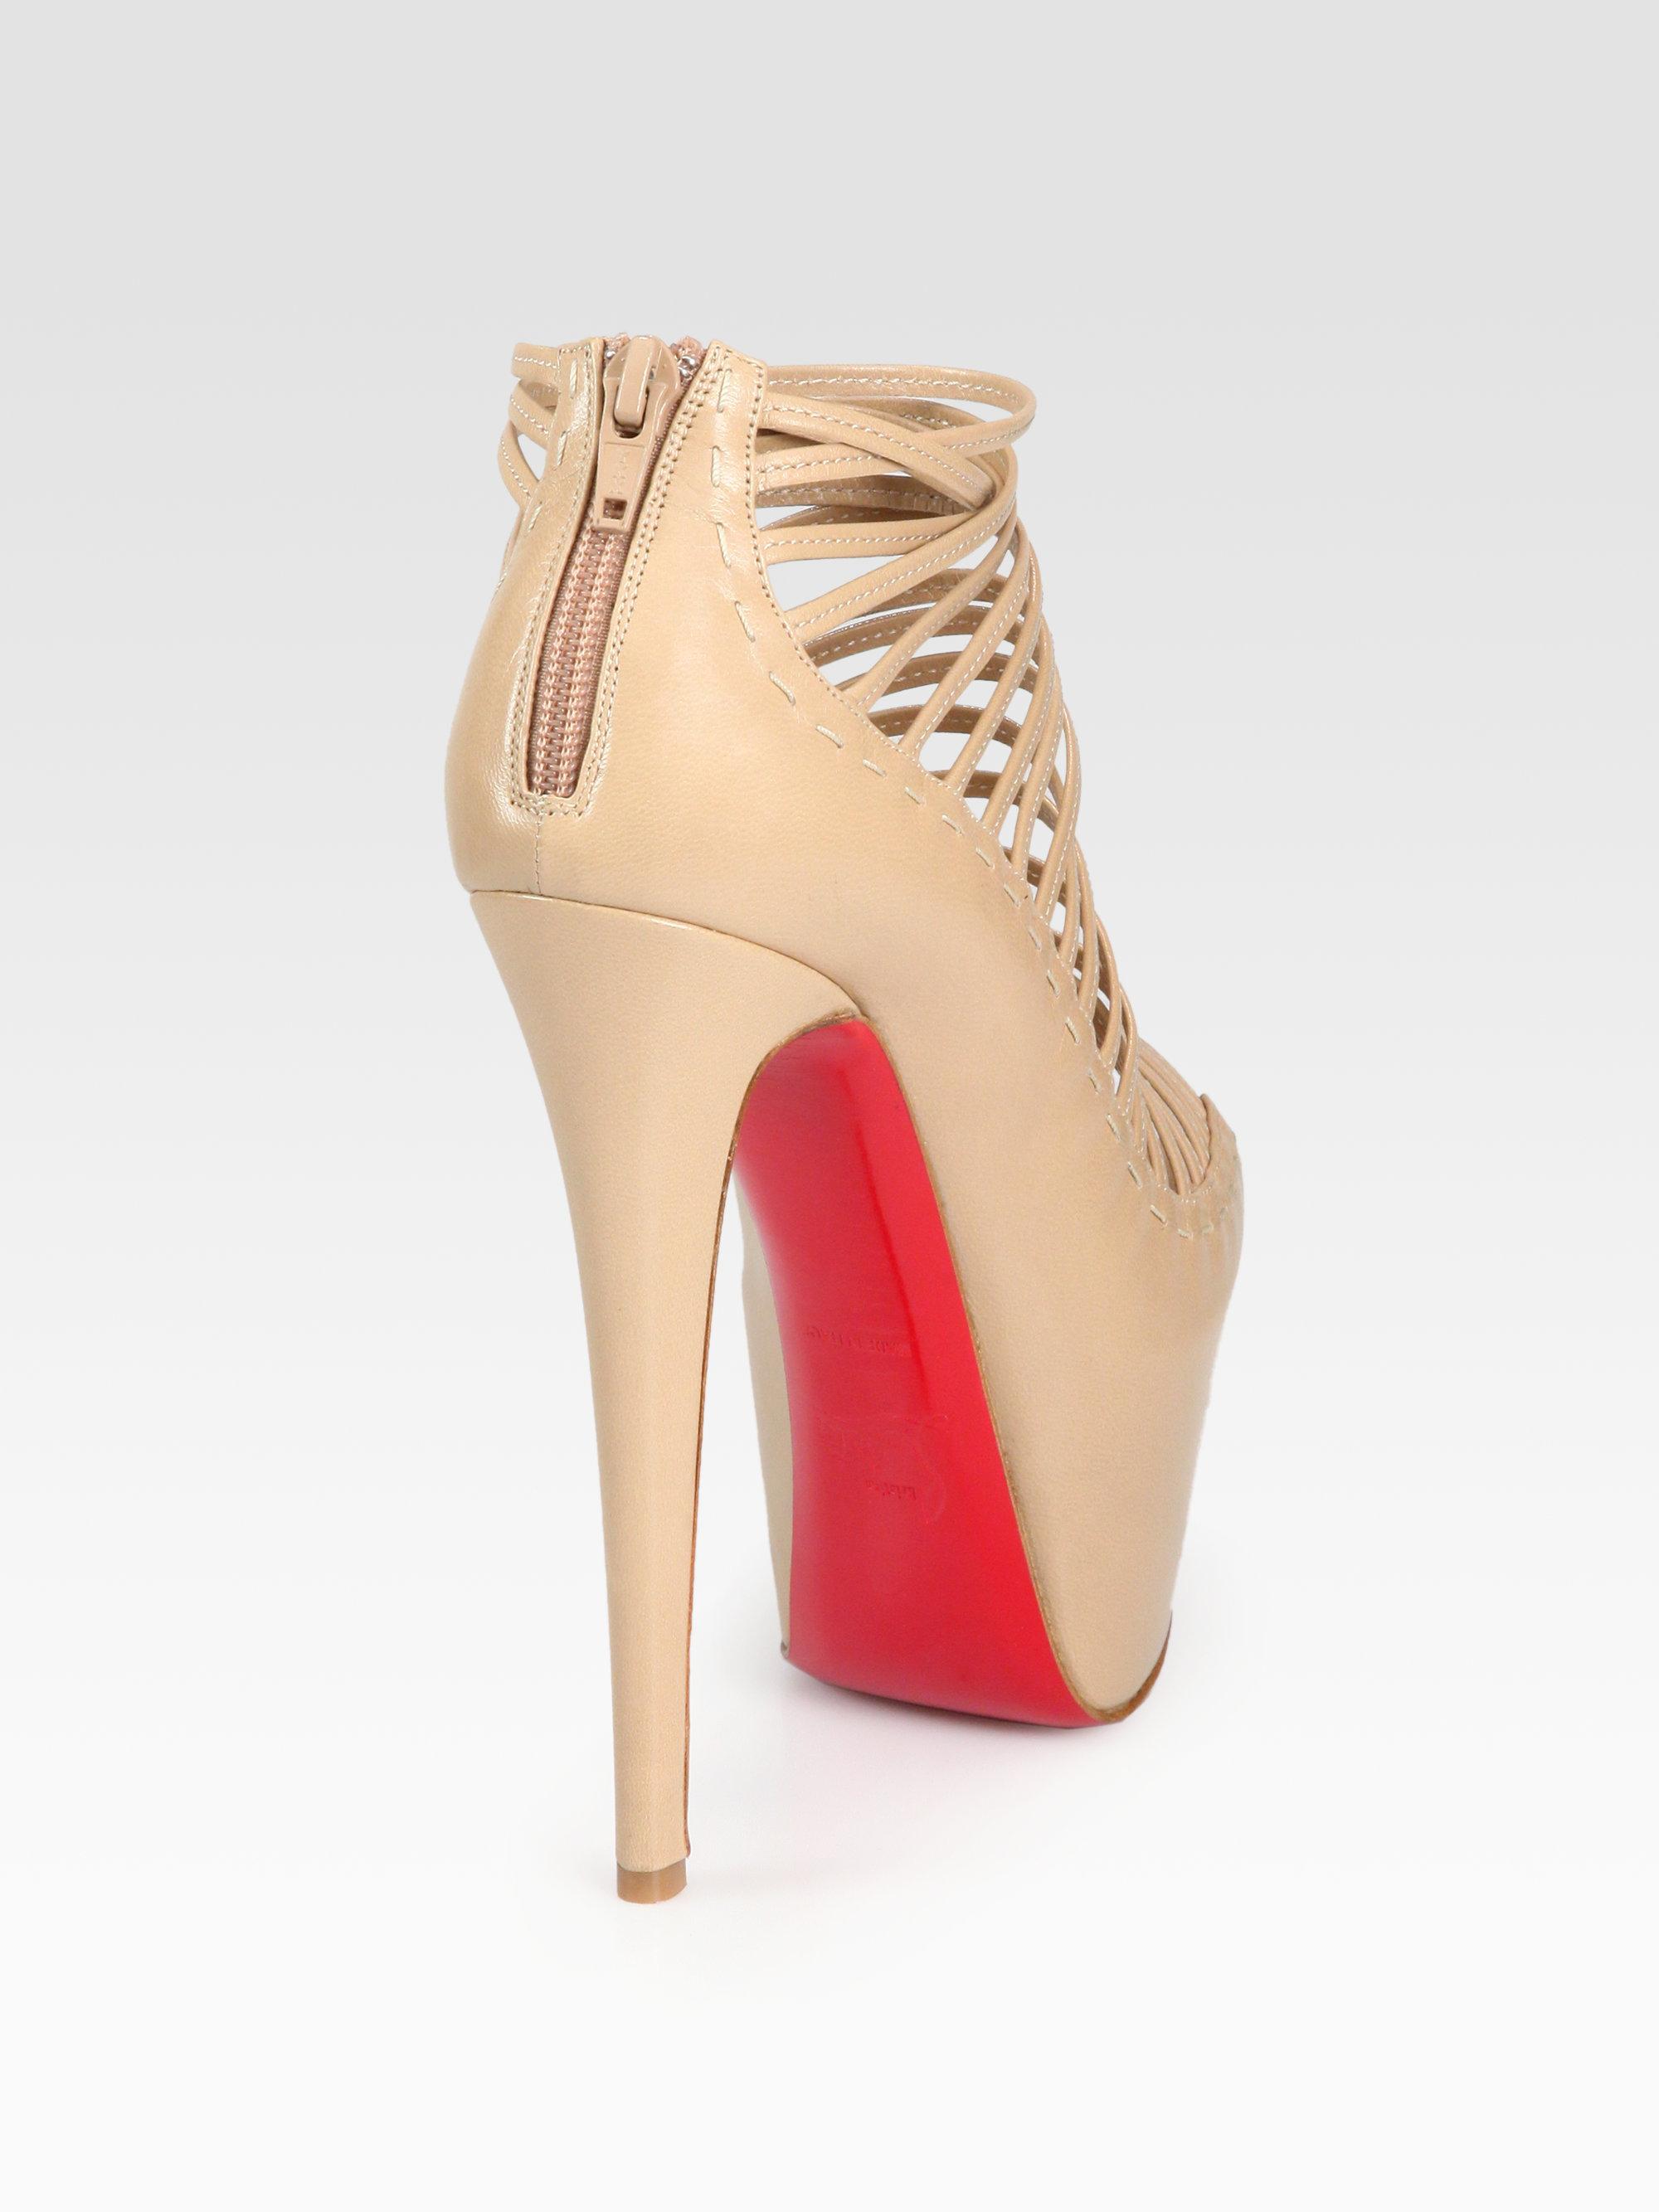 christian louboutin platform sandals Beige leather   The Little ...